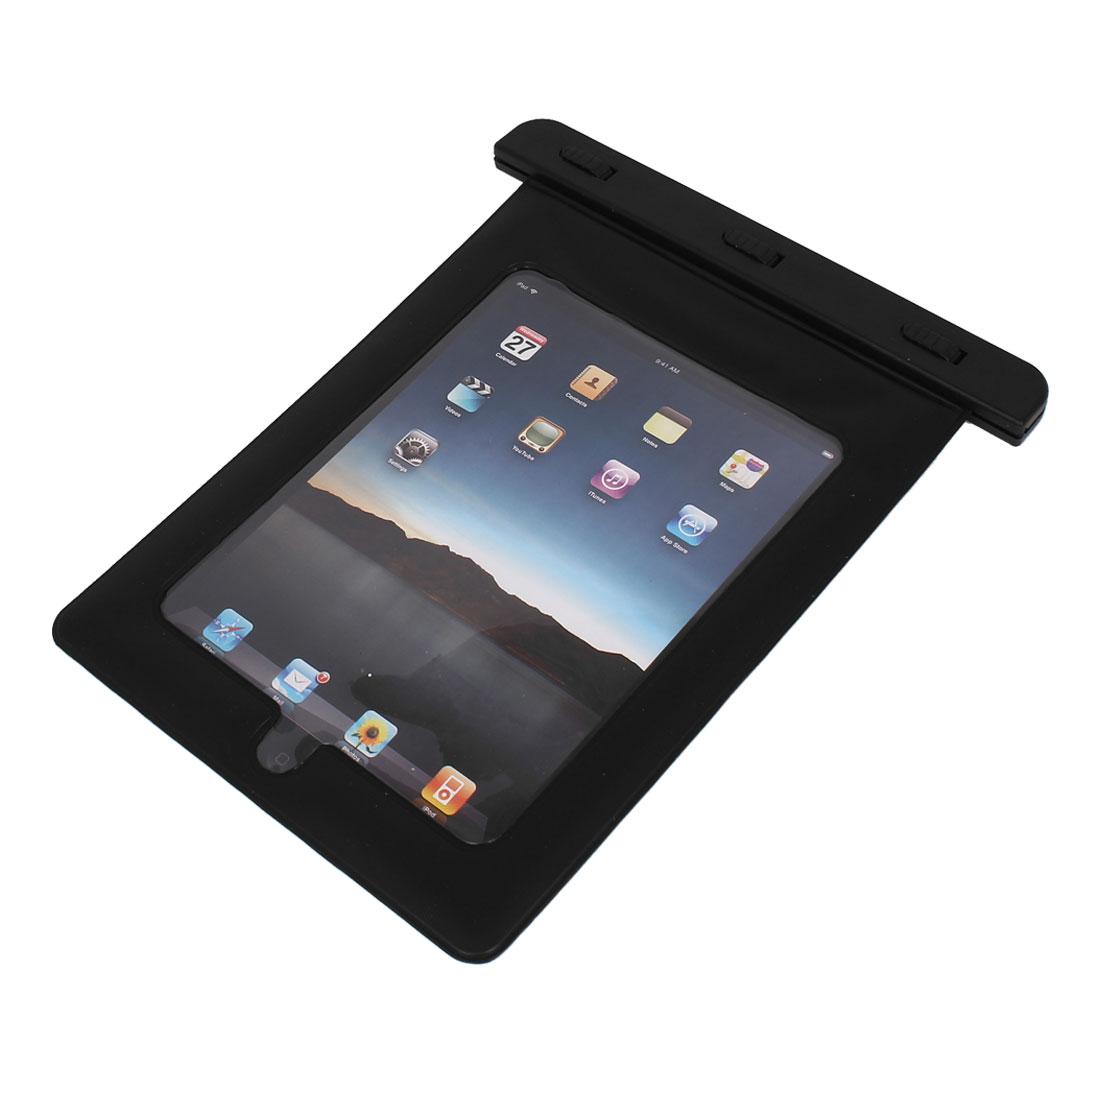 Waterproof Bag Dry Holder Protector Black for iPad Mini 1/2